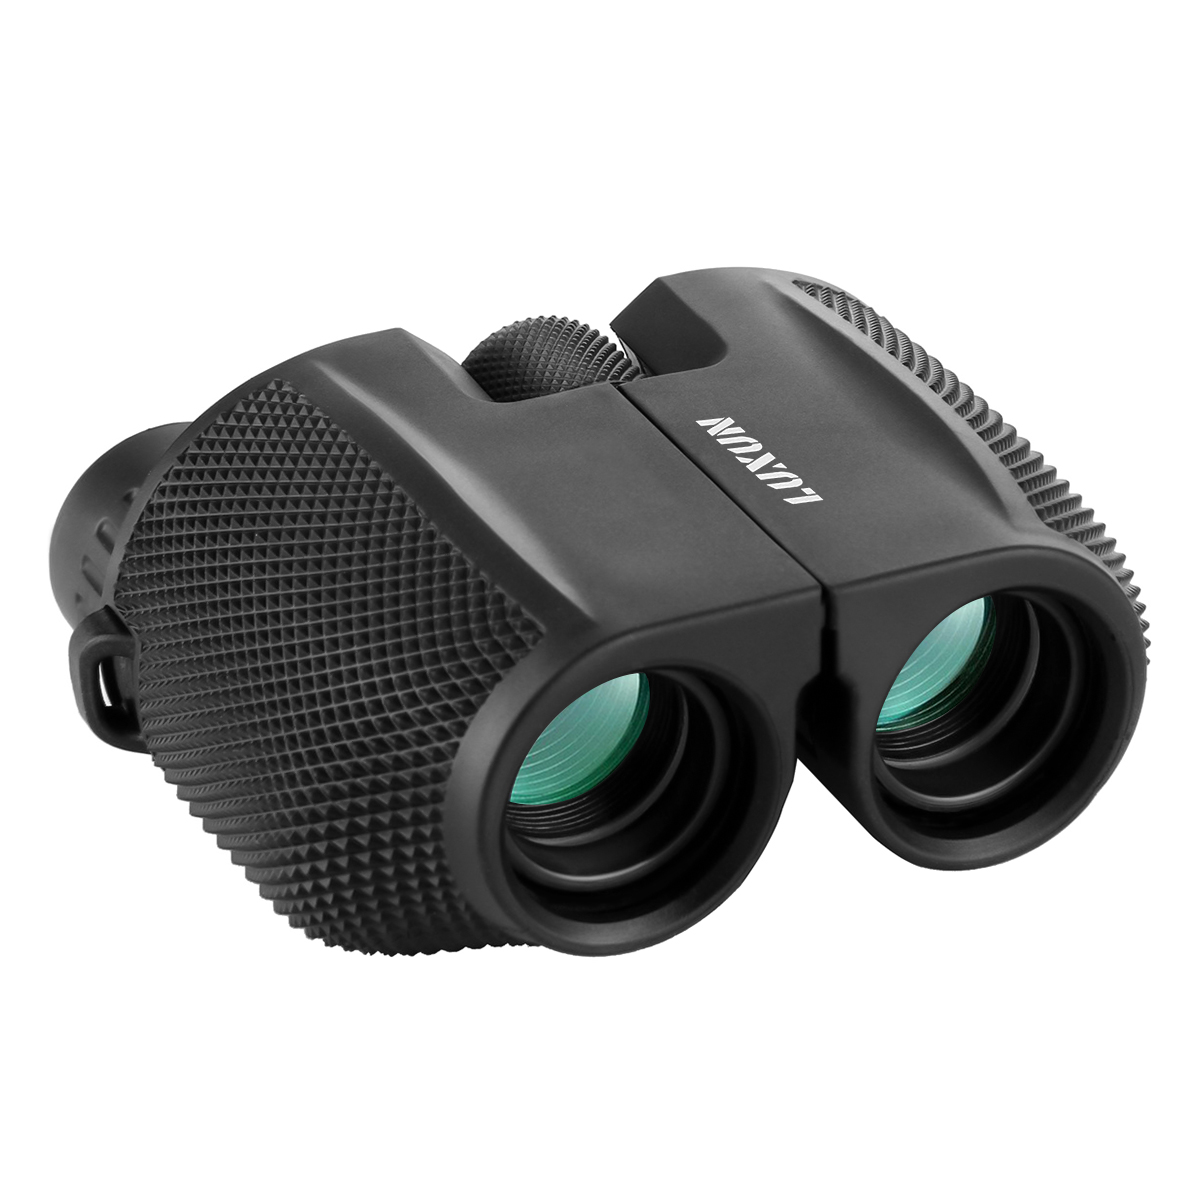 SGODDE 10x25 waterproof Light Night Vision Eyepiece Compact Binoculars outdoor